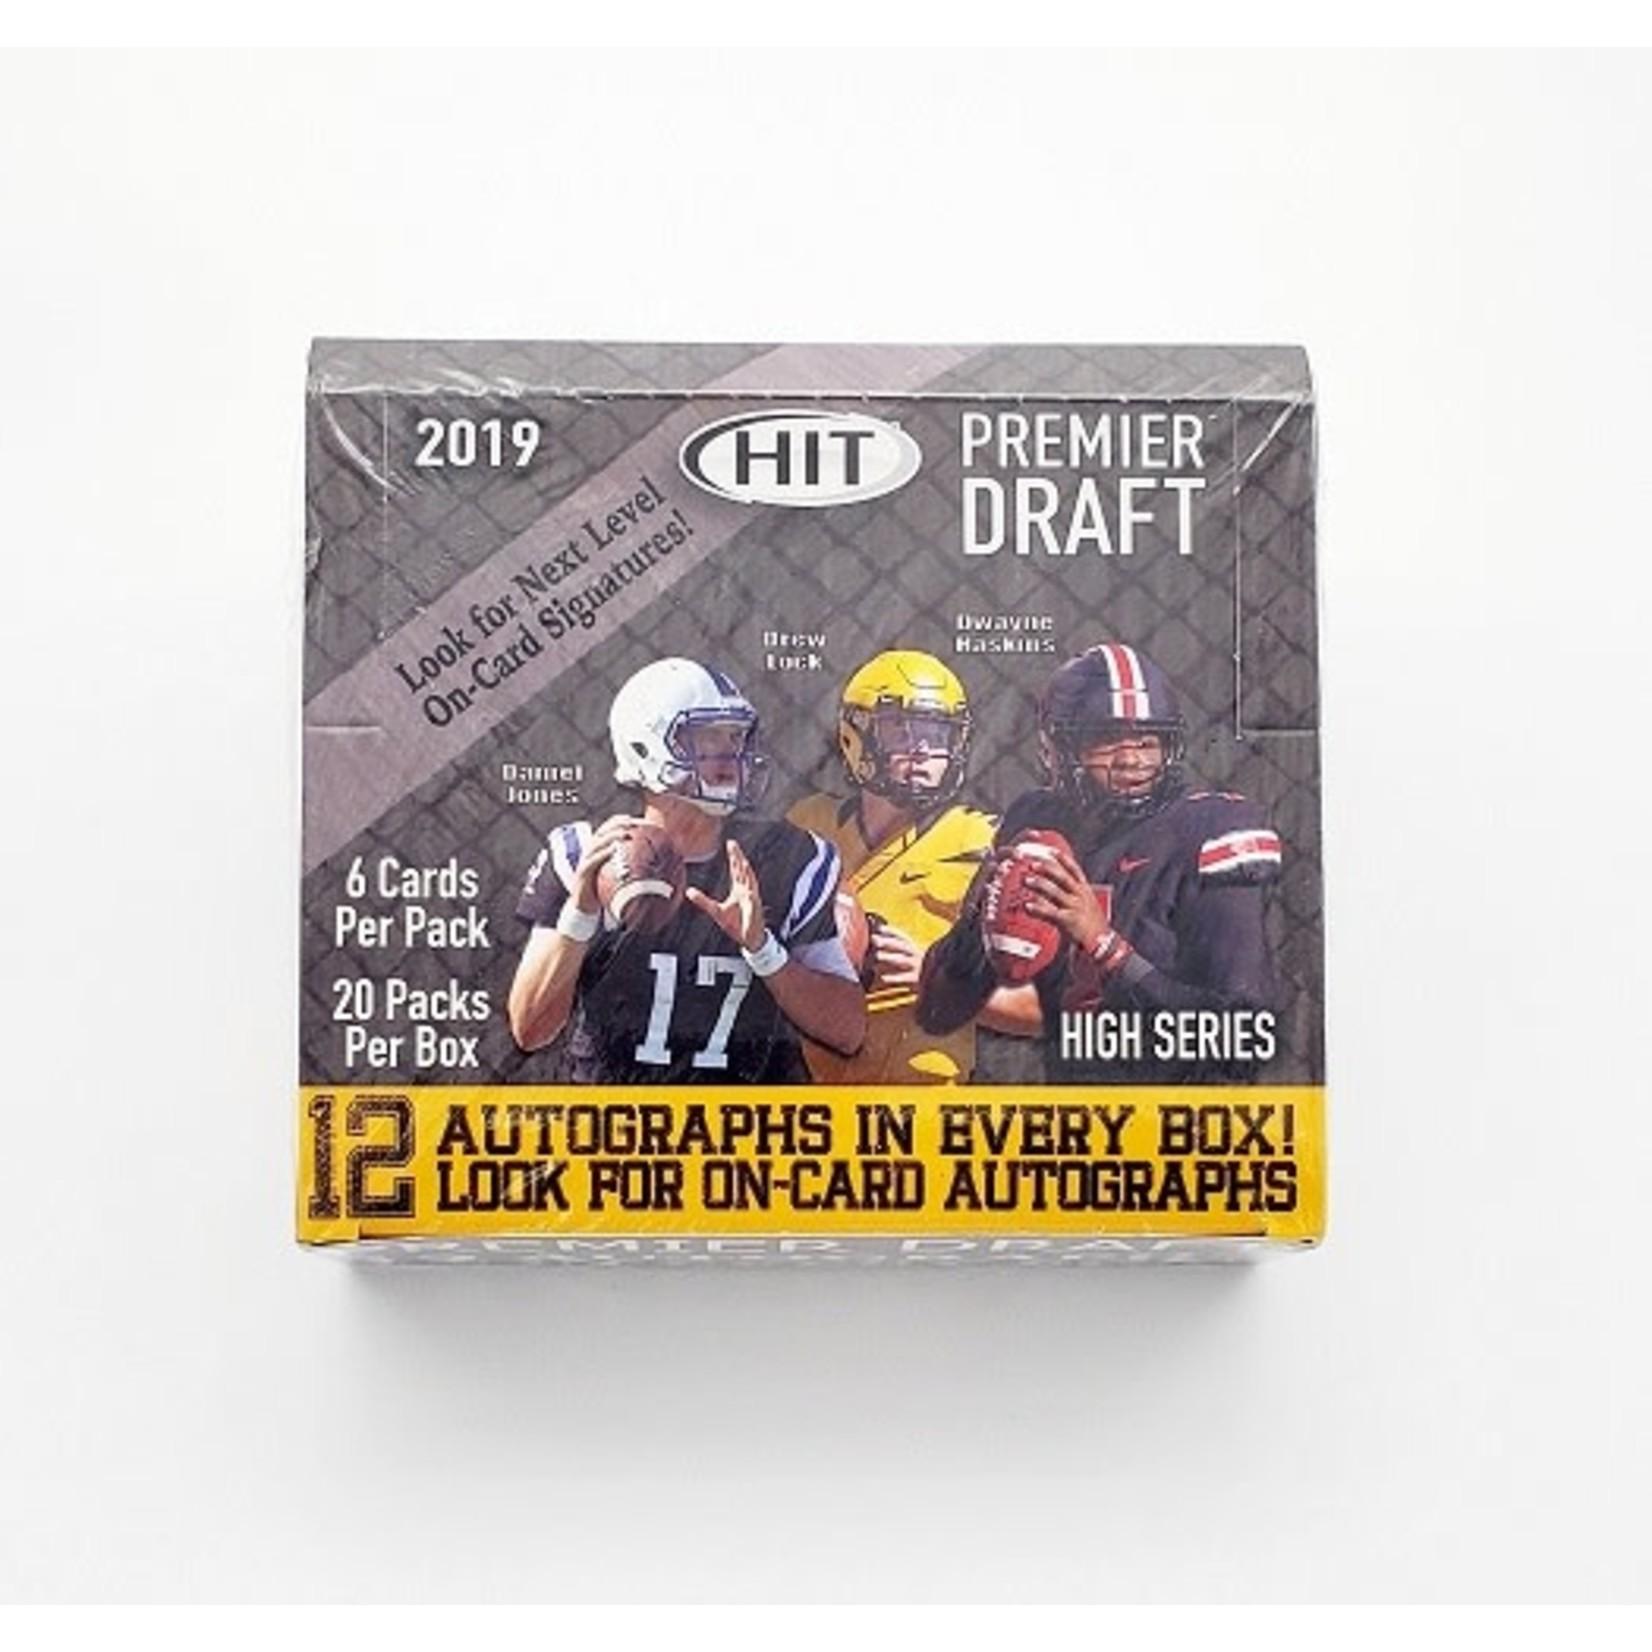 SAGE Collectibles 2019 SAGE Hit Football Premier Draft High Series Hobby Box